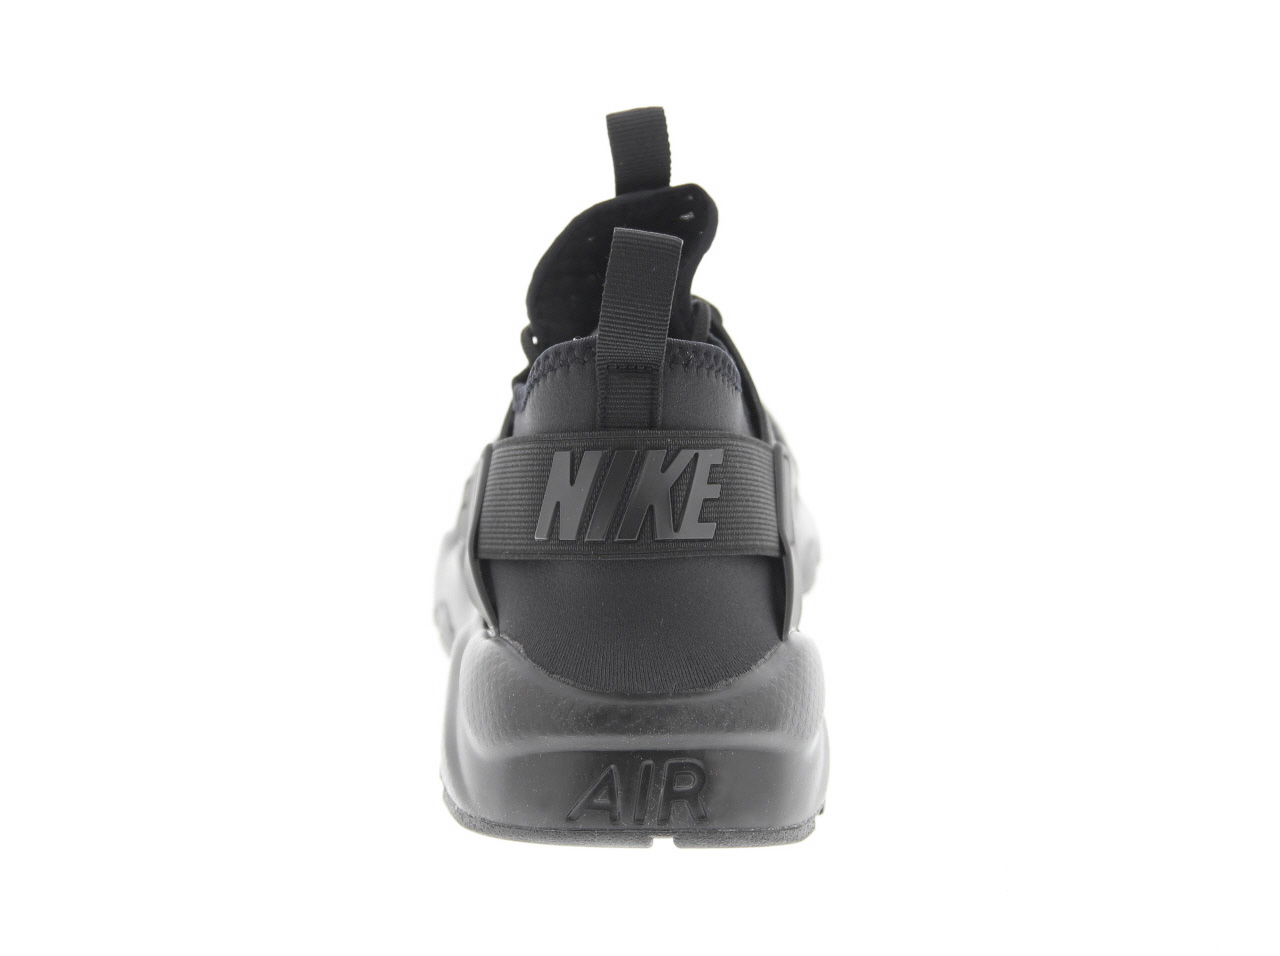 NIKE AIR HUARACHE RUN ULTRA BR (833147-001) BLACK/BLACK